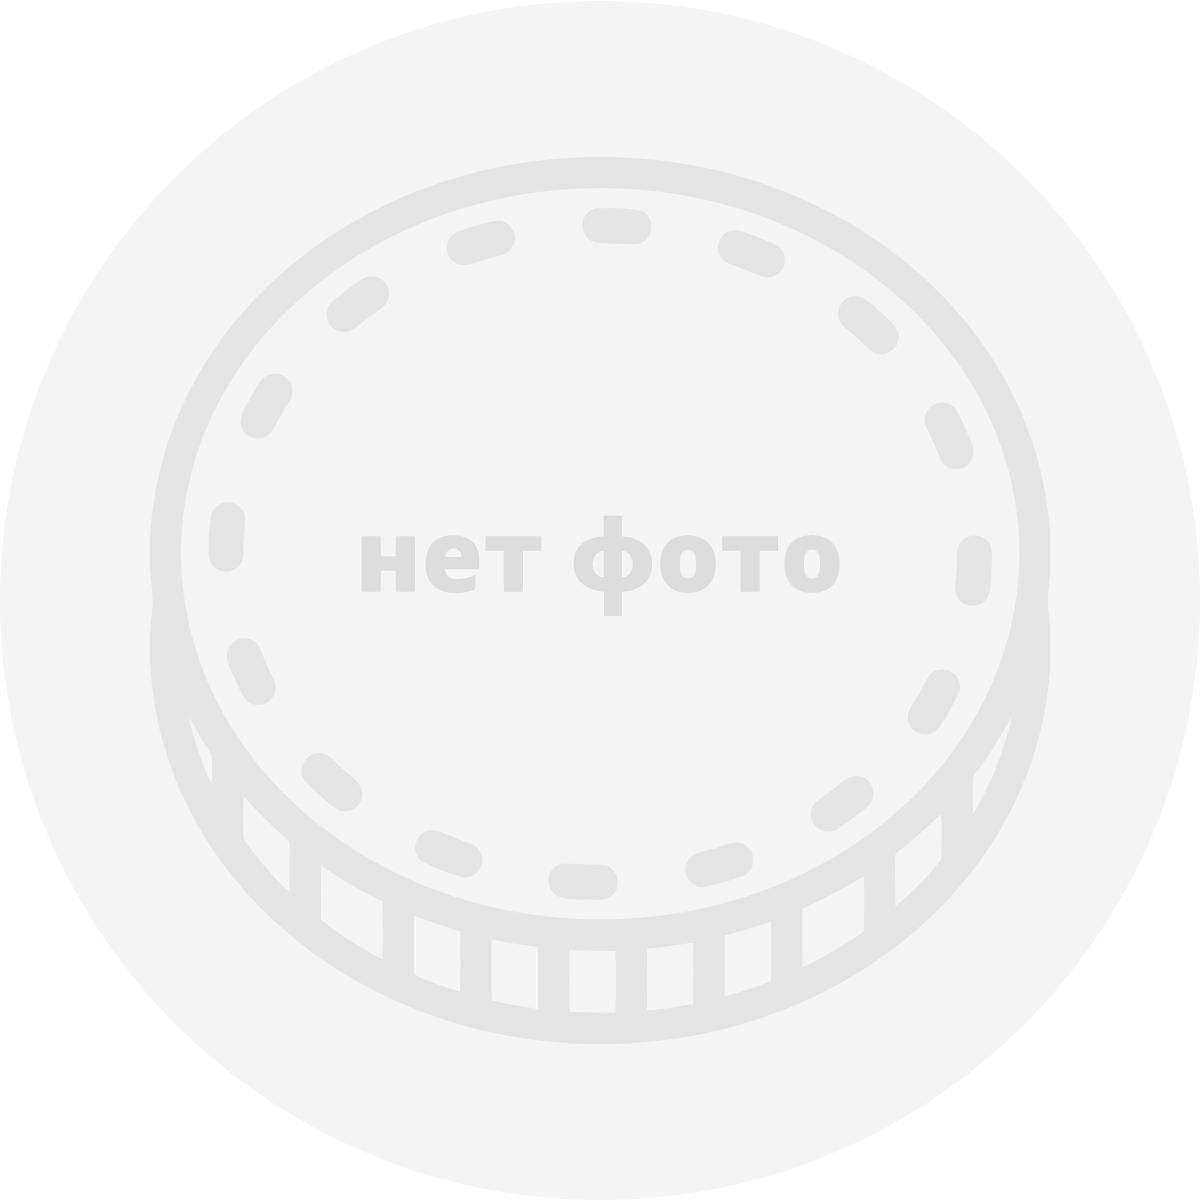 Kаталог монет Болгарии 2018